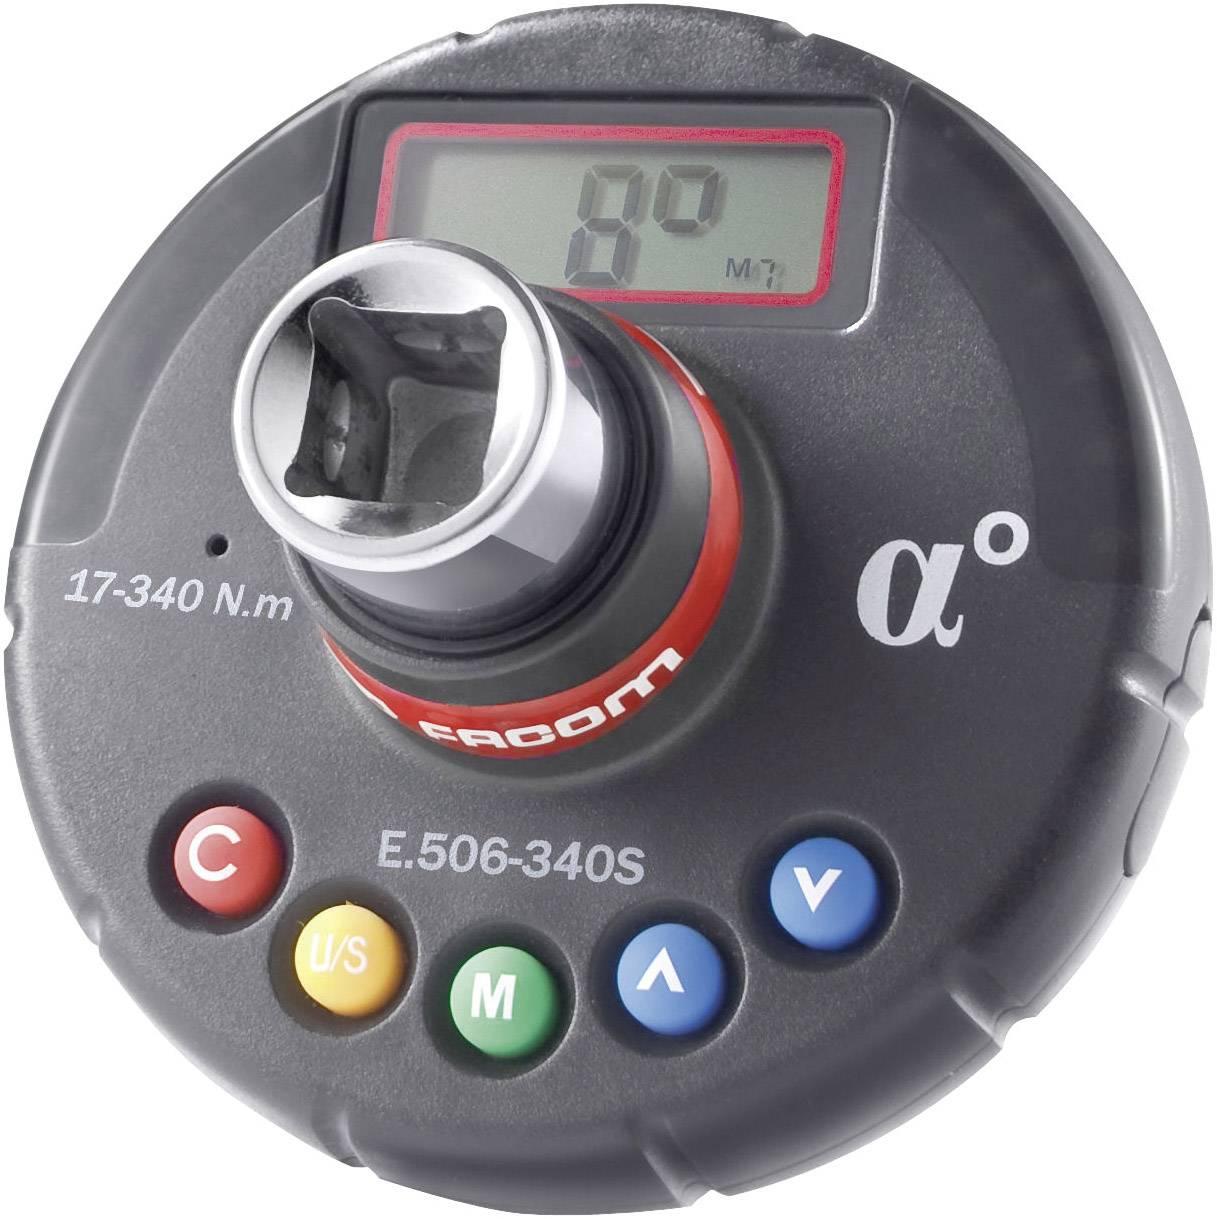 "Digitální momentový adaptér na ráčnu Facom E.506-340S, 1/2"" (12,5 mm), 17 - 340 Nm"